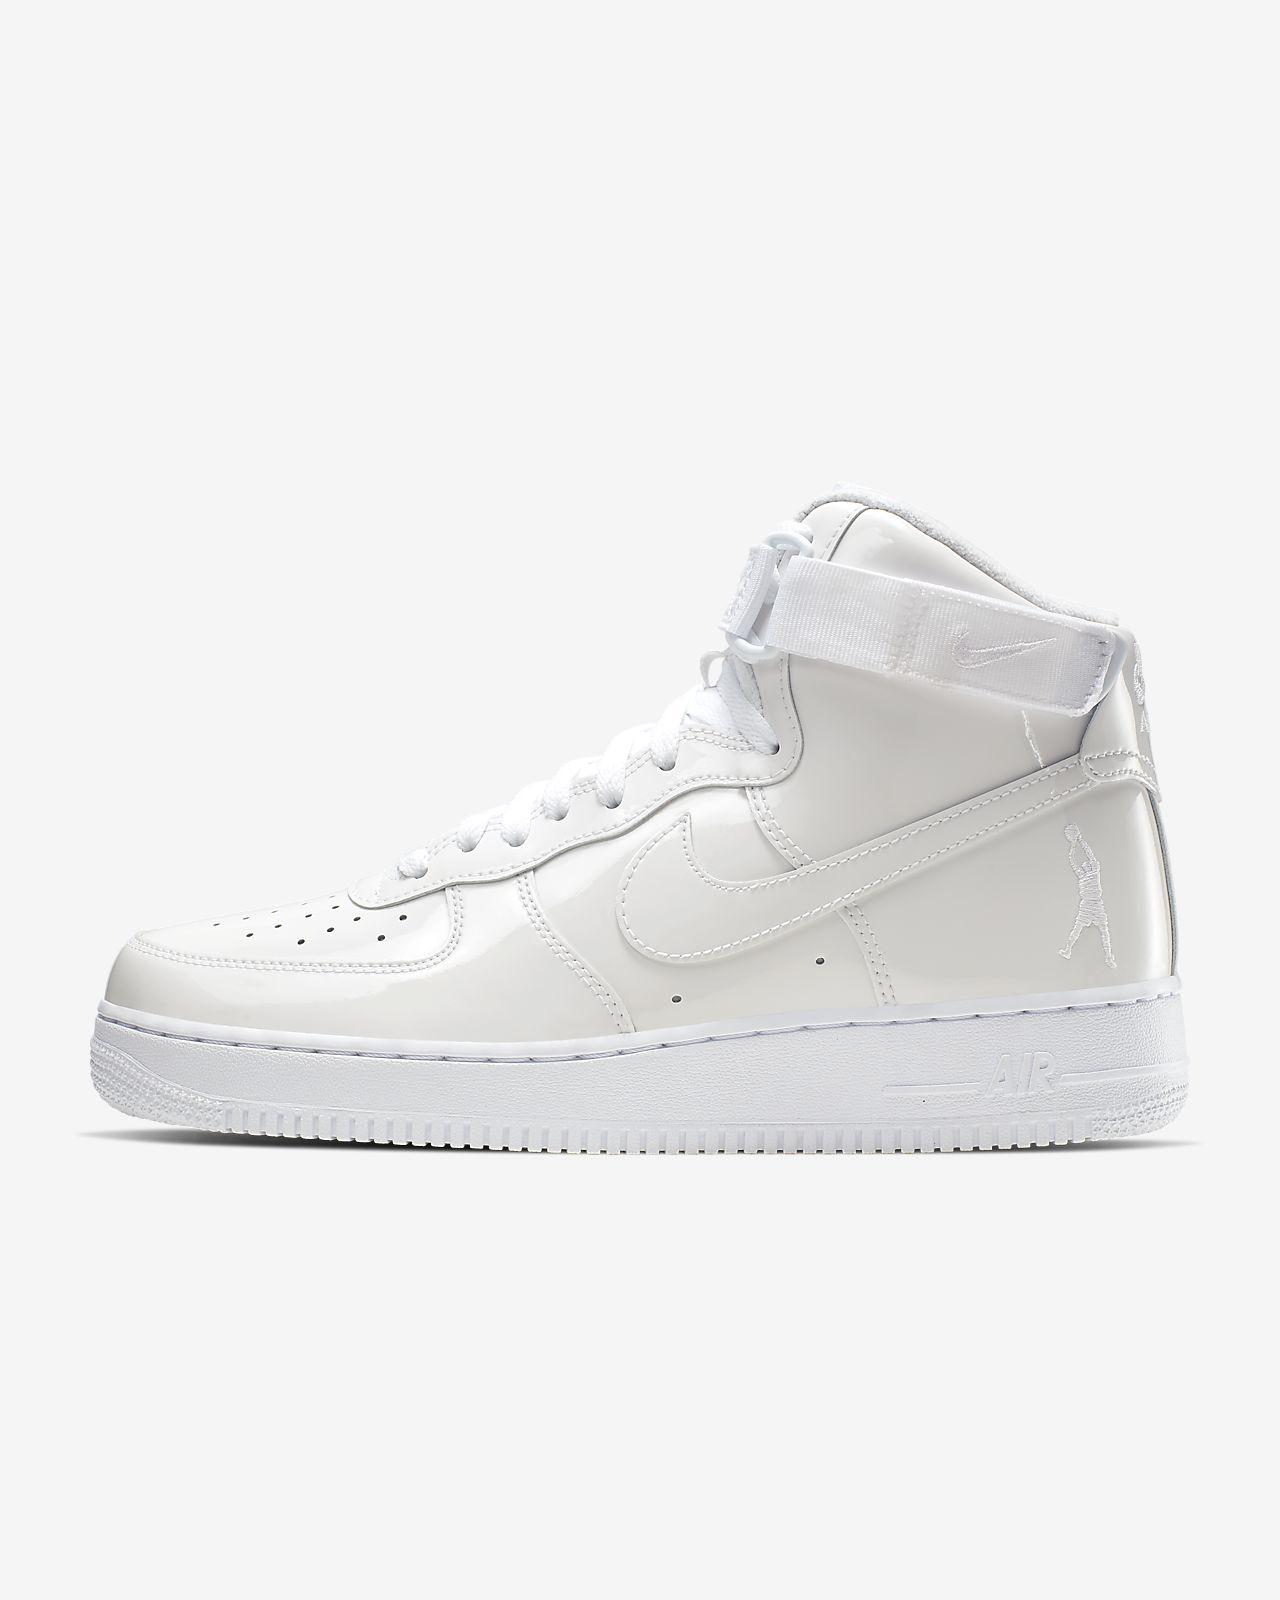 Nike Air Force 1 High Retro QS Men\u0027s Shoe